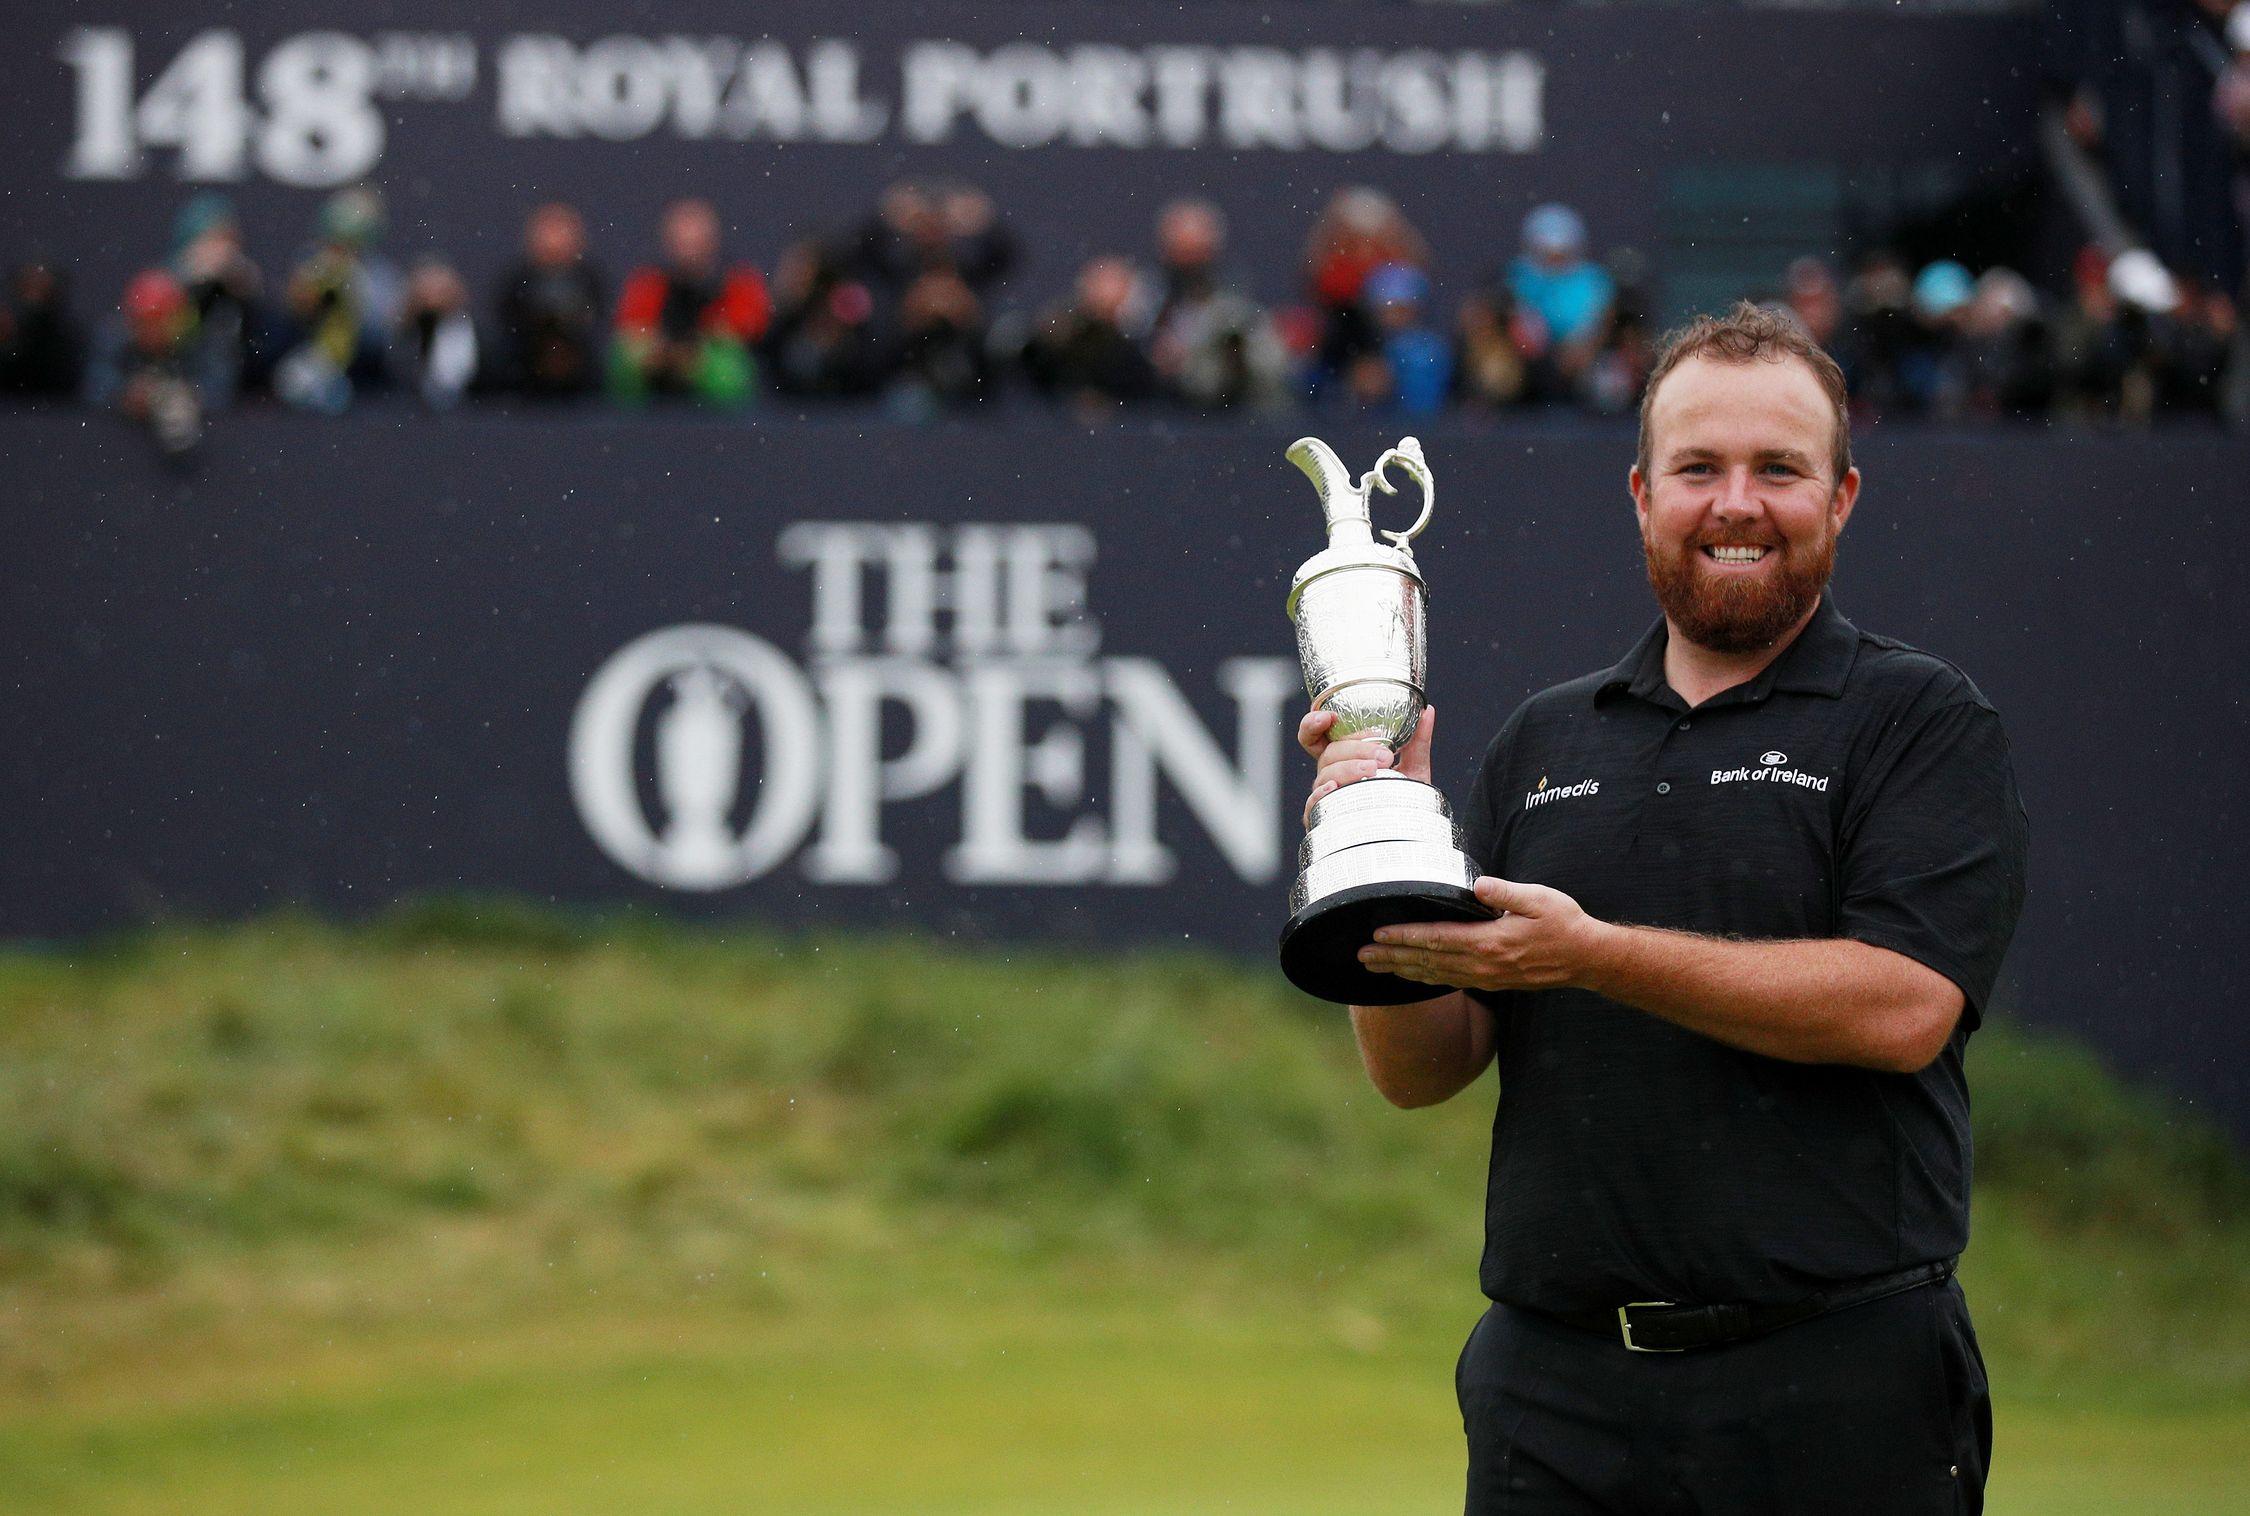 Golf - Tour européen - Irish Open : sans Jon Rahm mais avec Shane Lowry